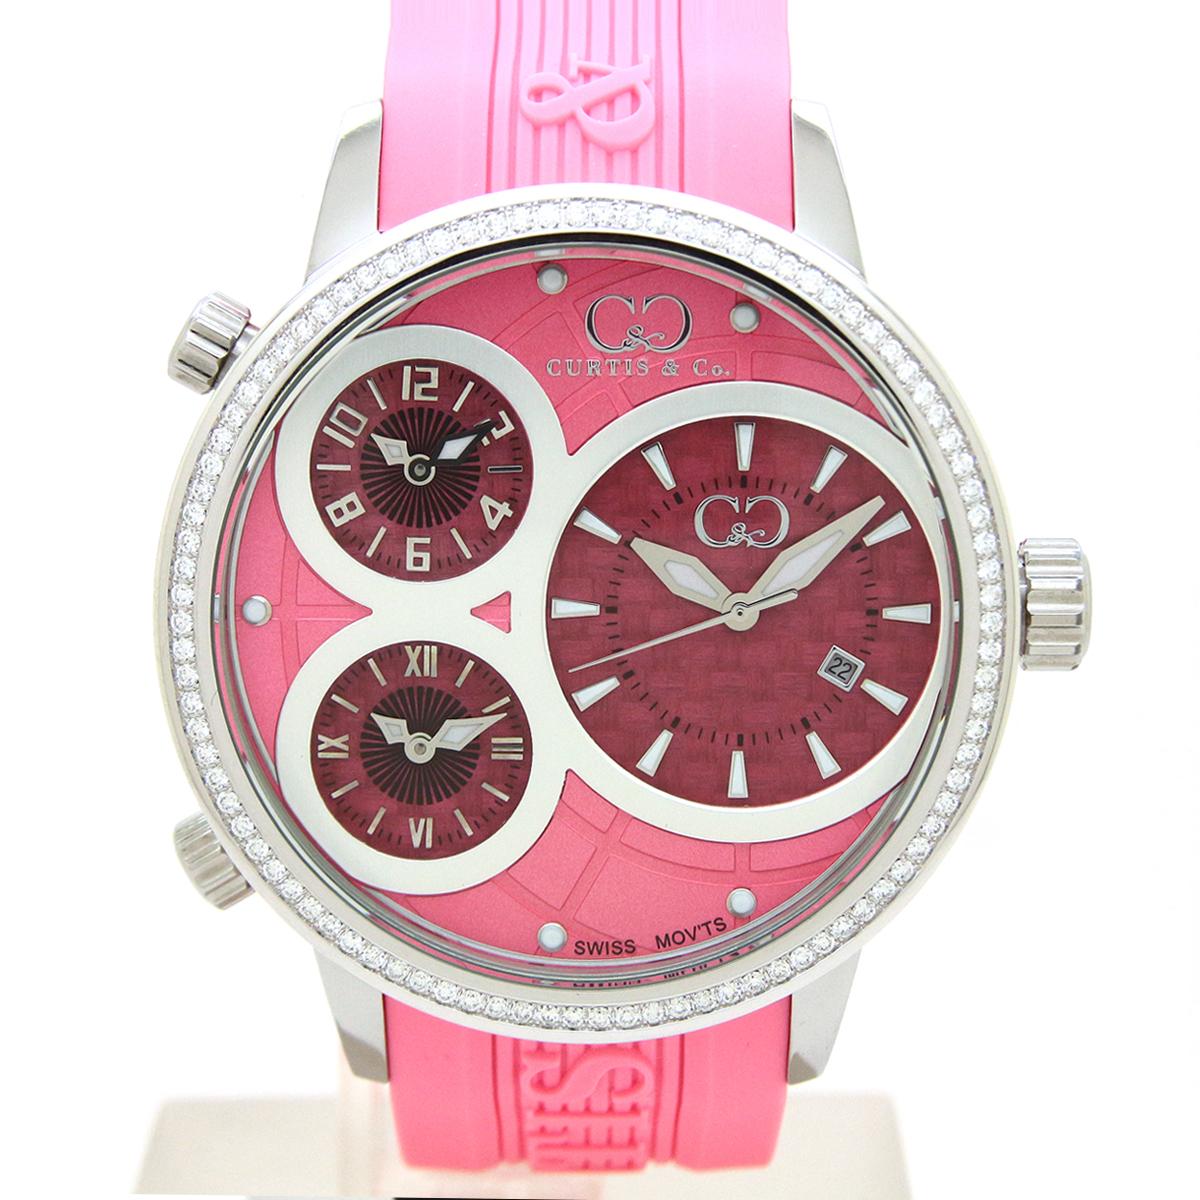 CURTIS&Co(カーティス)BIG TIME WORLD 50mm(Pink) カーティス ビックタイムワールド50mm ダイヤモンド【腕時計】